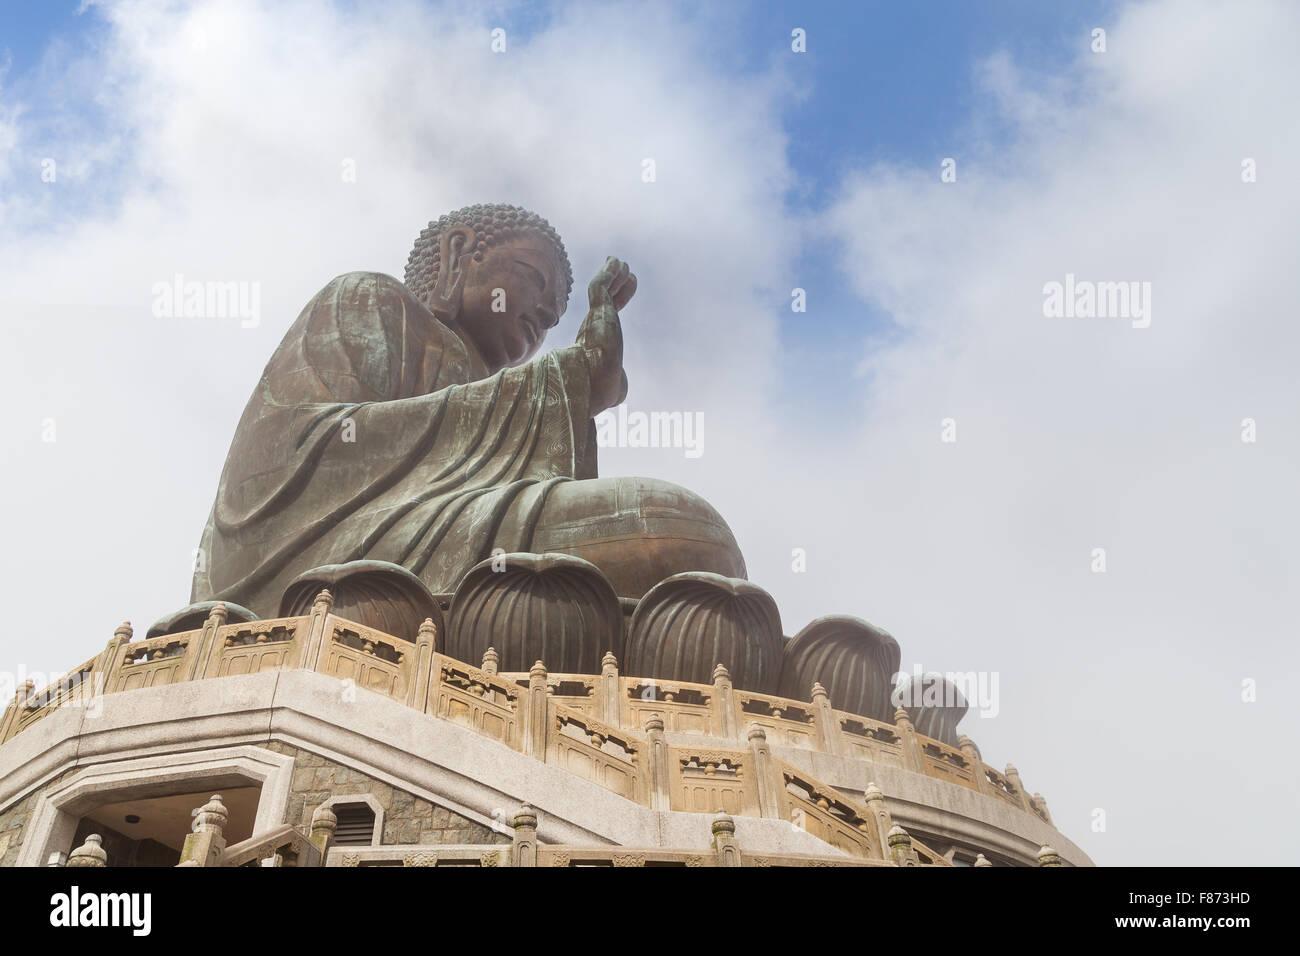 Tian Tan Buddha or Big Buddha statue in Lantau Island, Hong Kong, China, viewed from below. - Stock Image